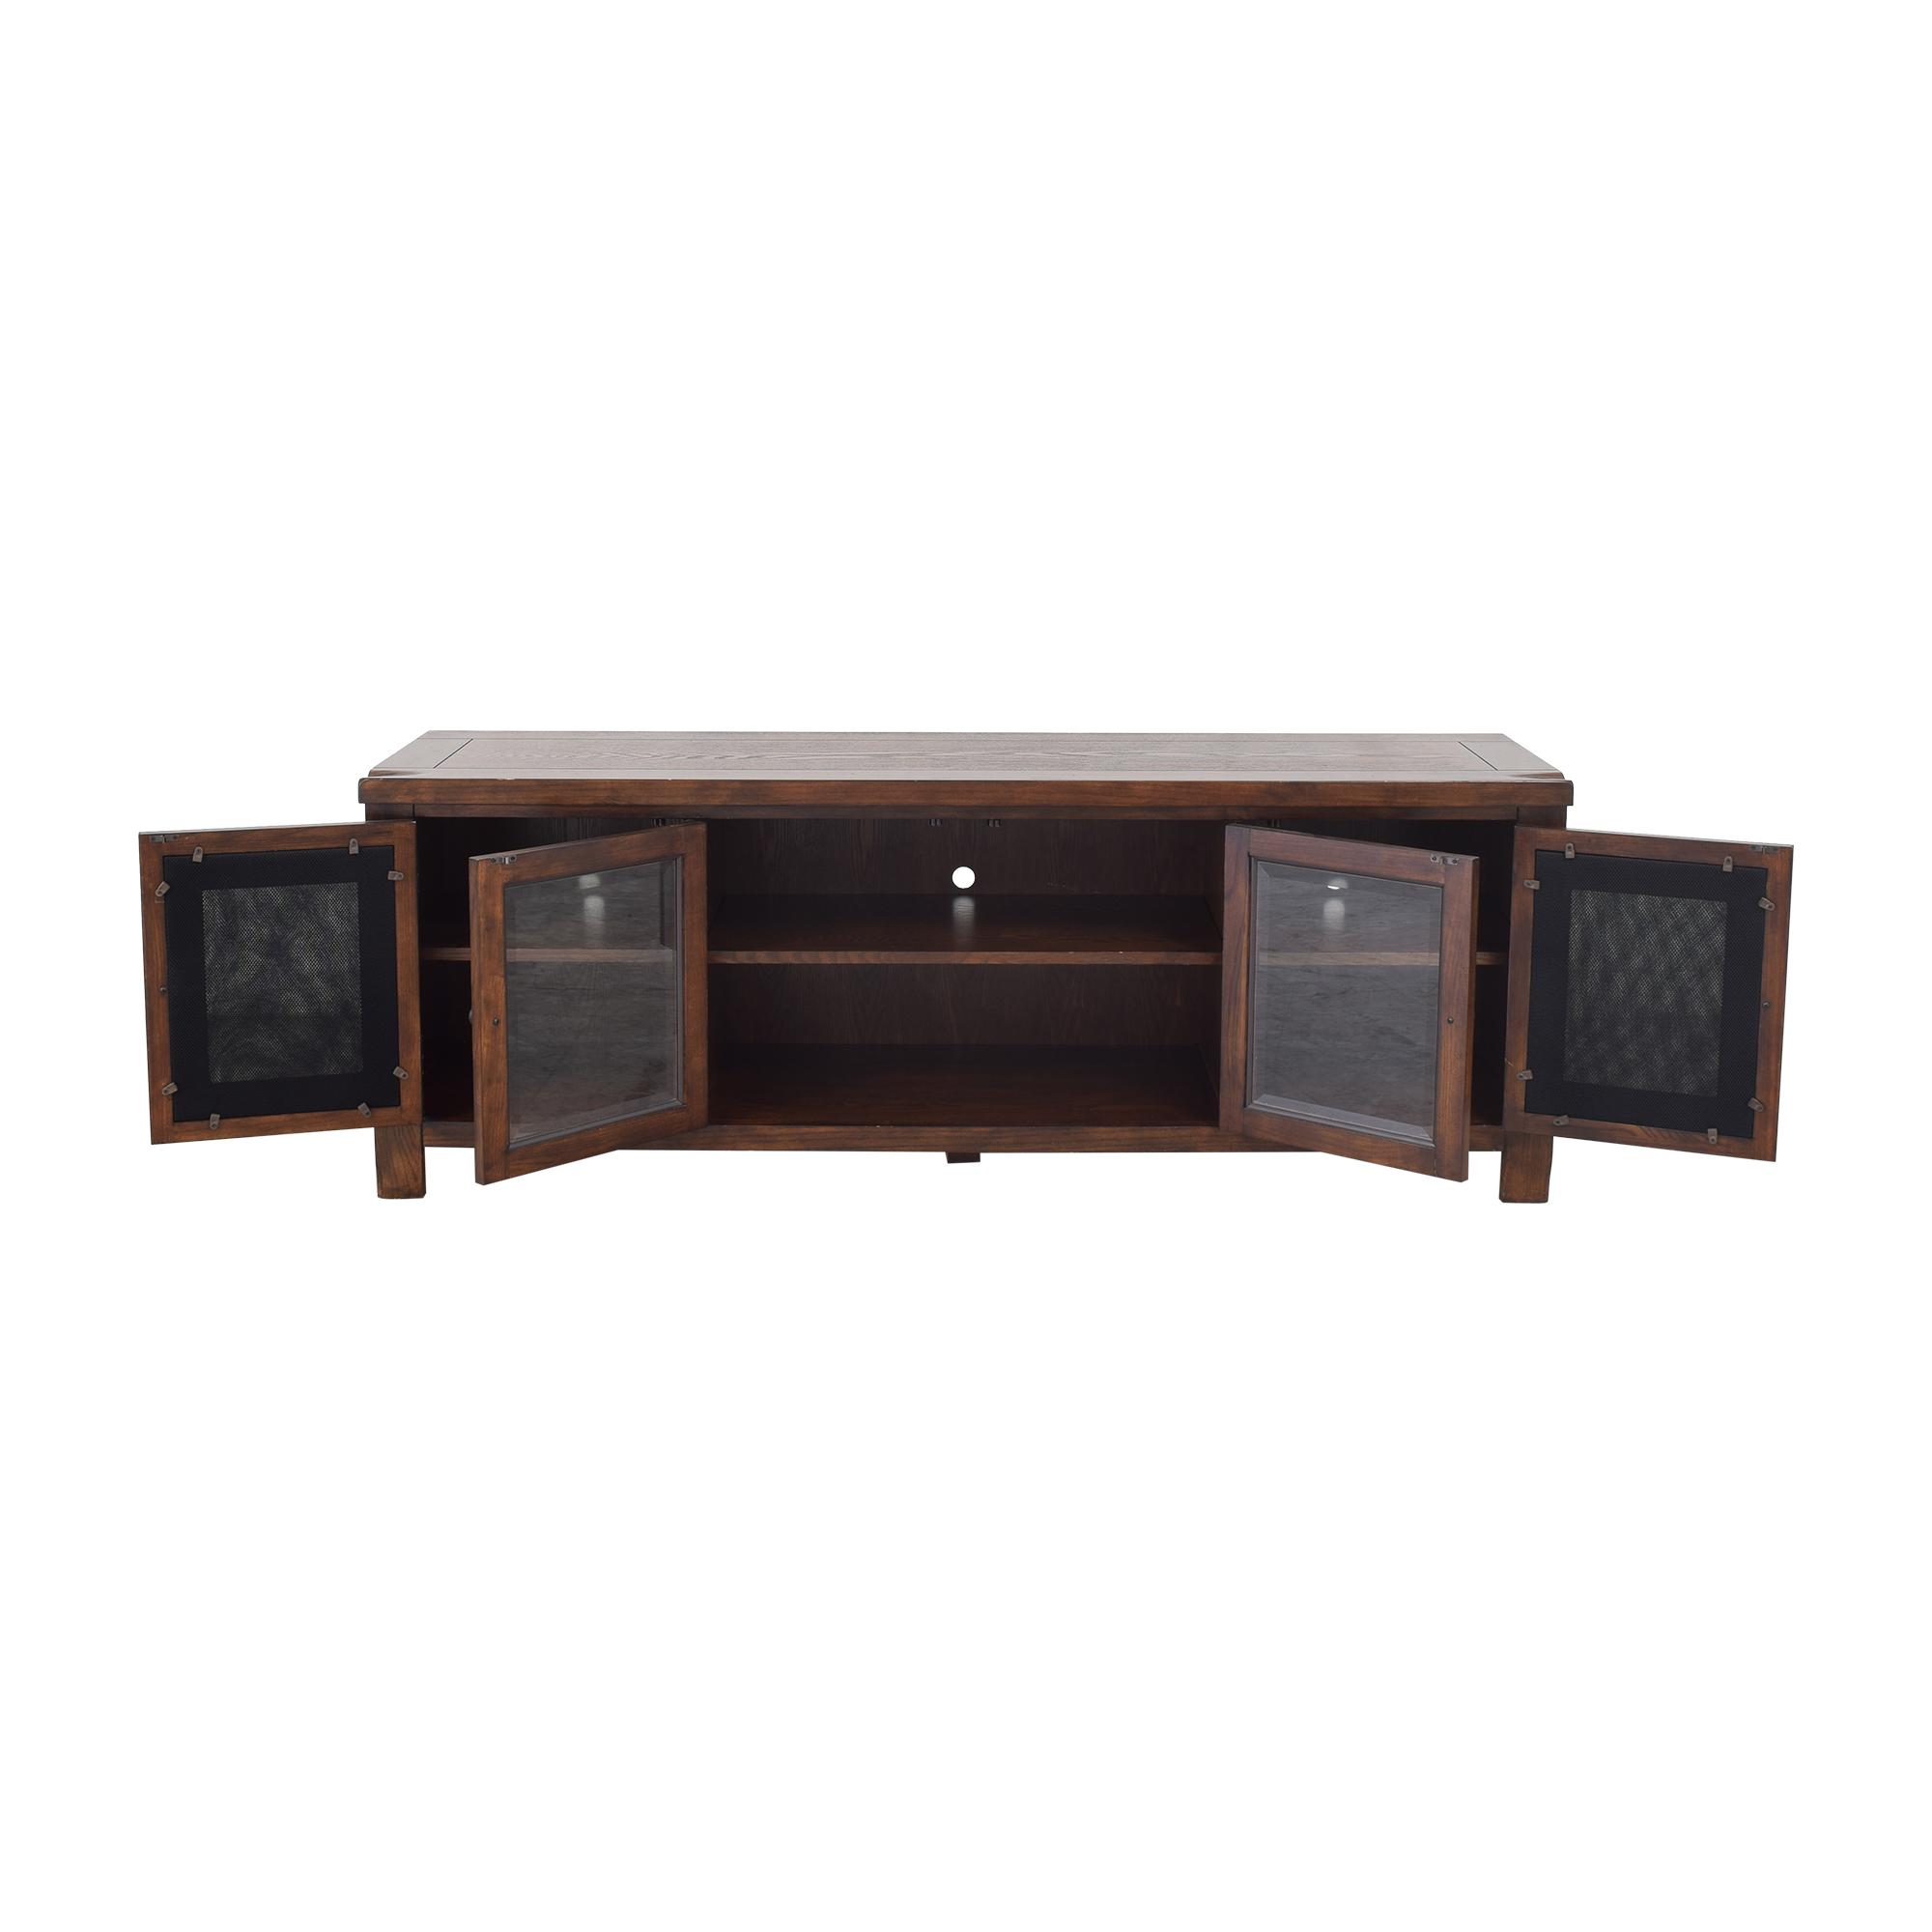 Emerald Home Furnishings Pampa Furniture Media Center used